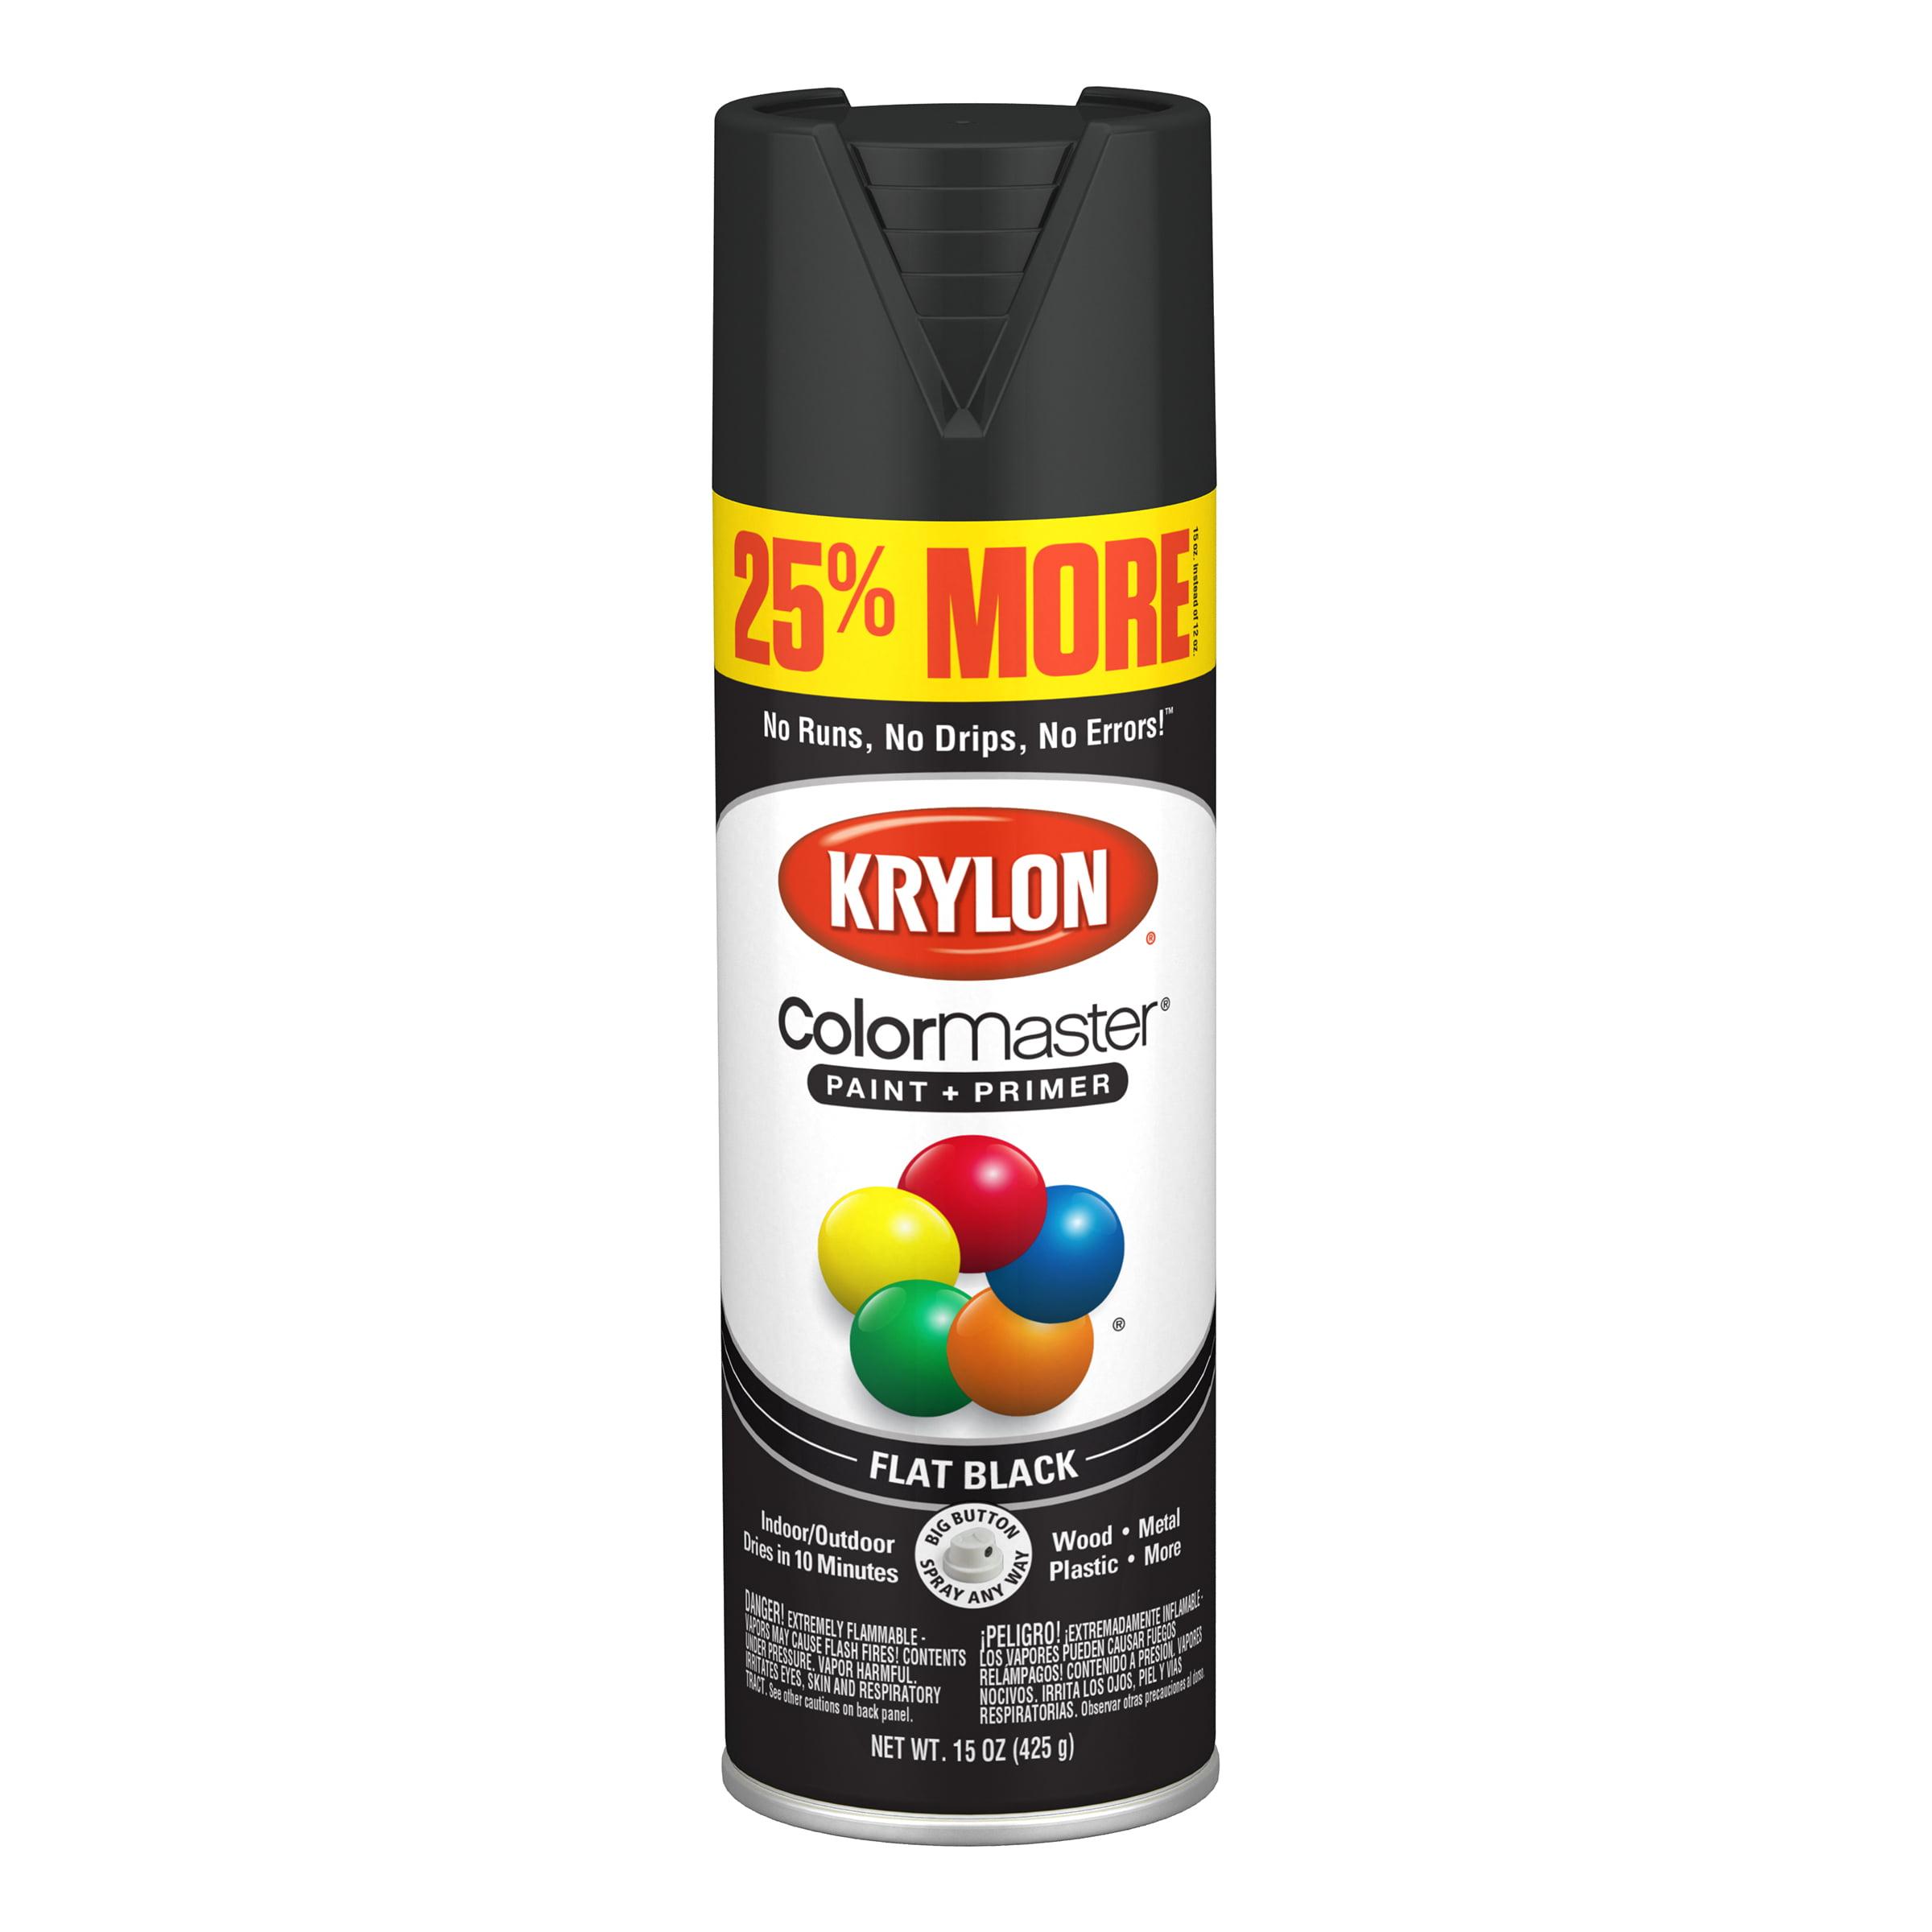 Krylon® ColorMaster Paint + Primer Flat Black, 15-Oz